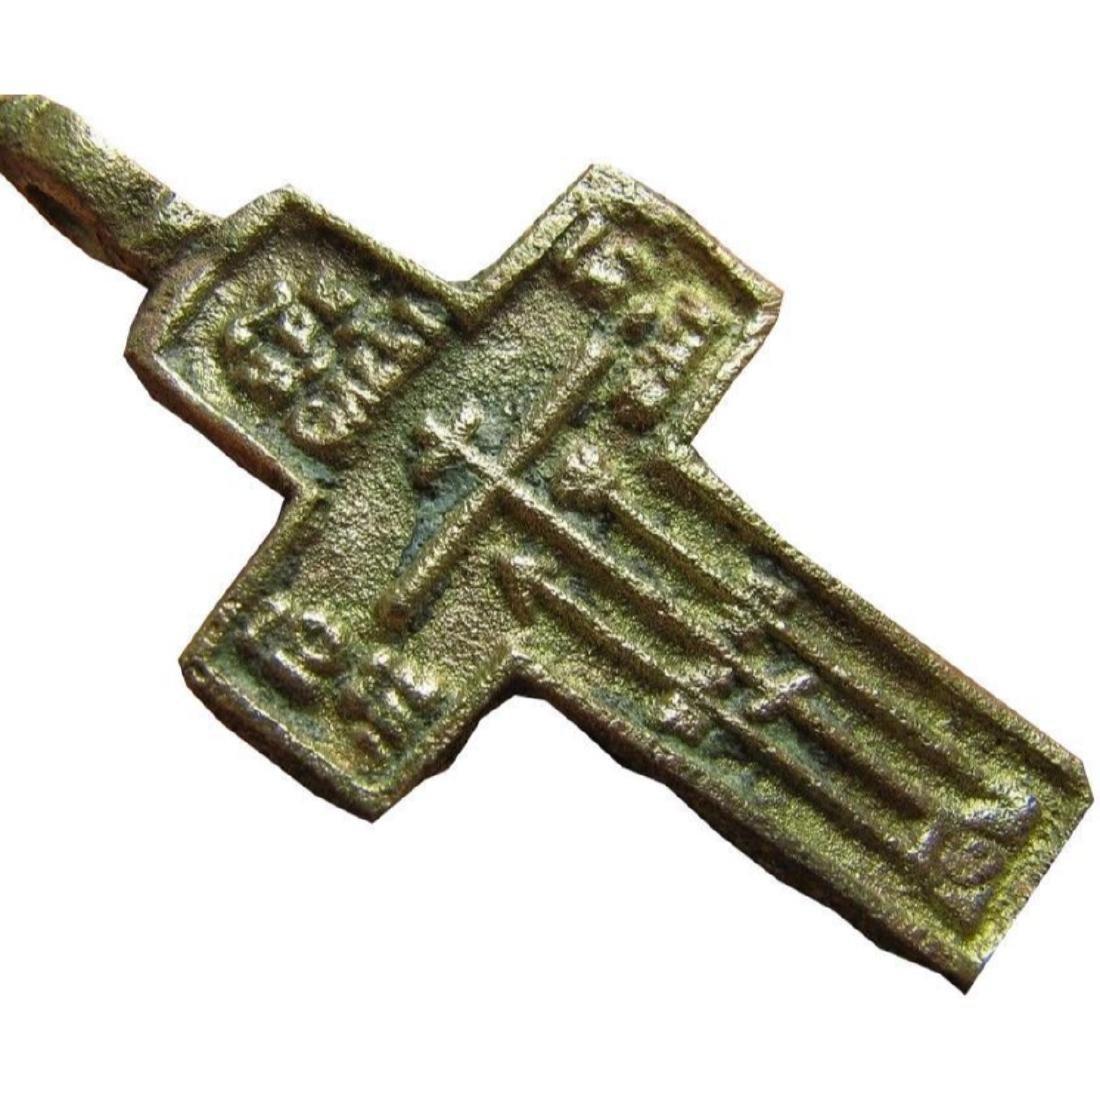 Rare Prayer Relief Big Late Medieval Orthodox Bronze - 8